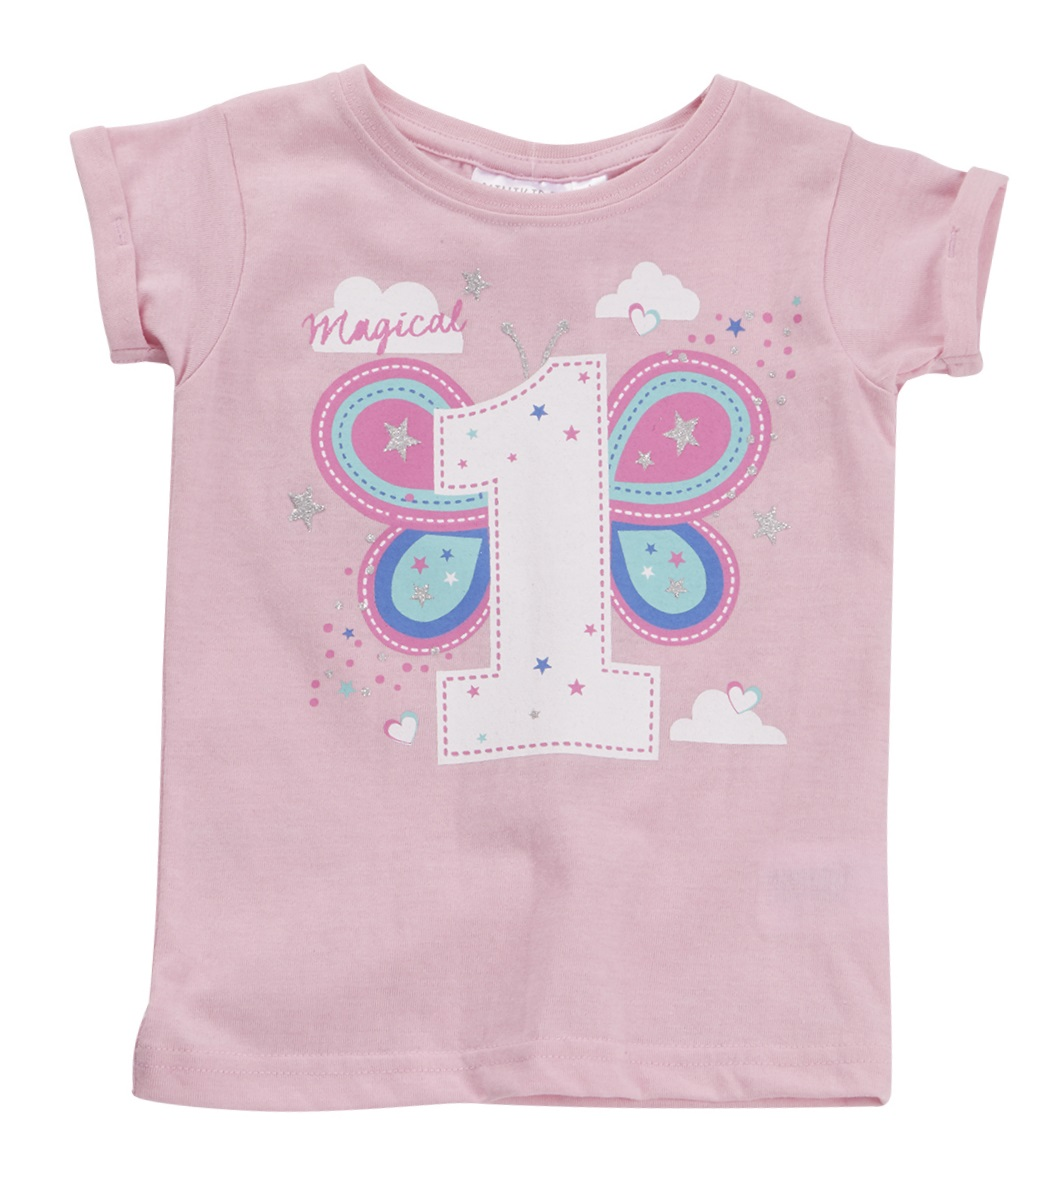 Toddler Birthday Shirts